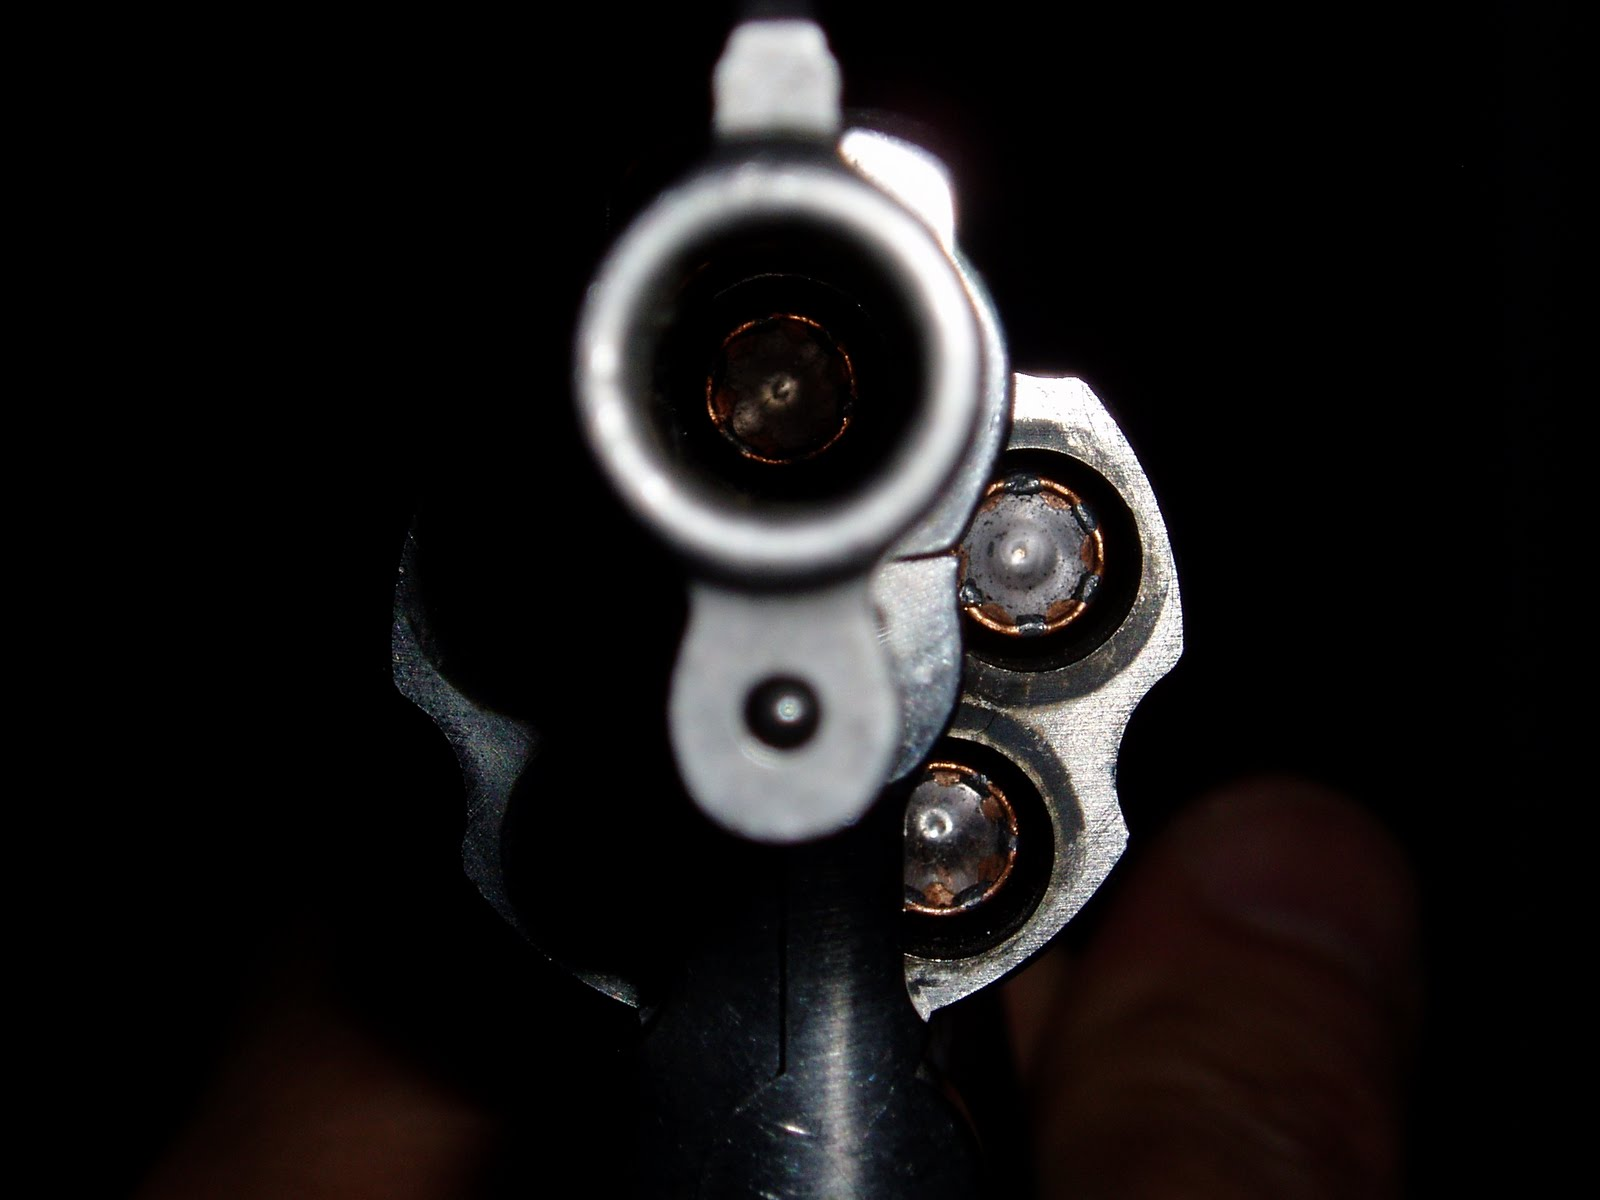 http://3.bp.blogspot.com/_6F1goSN3h9s/TJq2taLpimI/AAAAAAAAAXc/vmdHa-HPDV8/s1600/violence,+rebellion+and+roits+%285%29.jpg